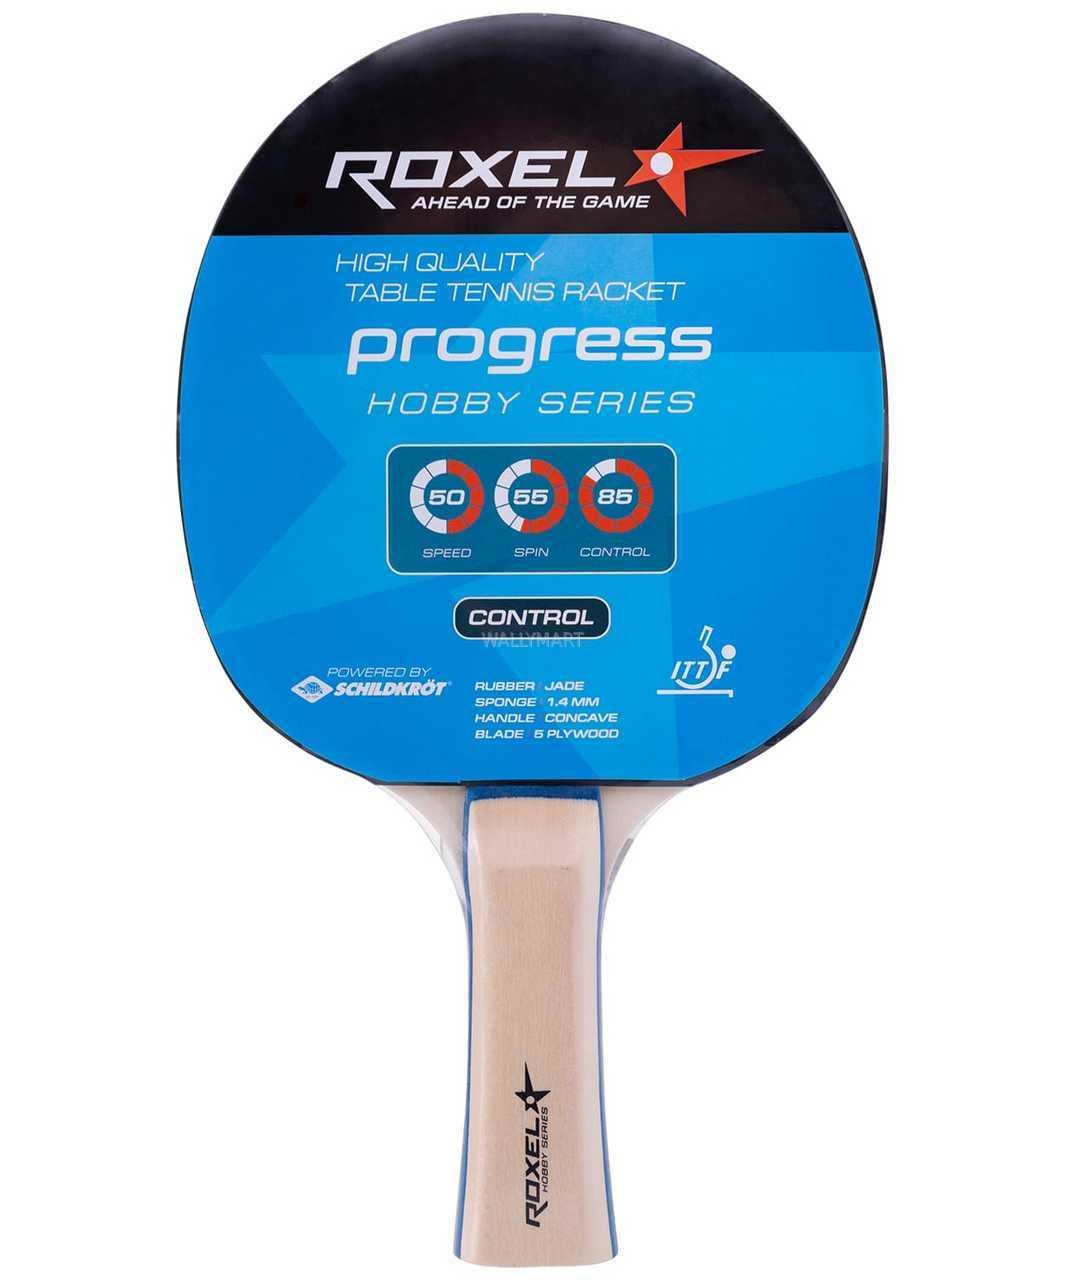 Ракетка для настольного тенниса Roxel Hobby Progress,